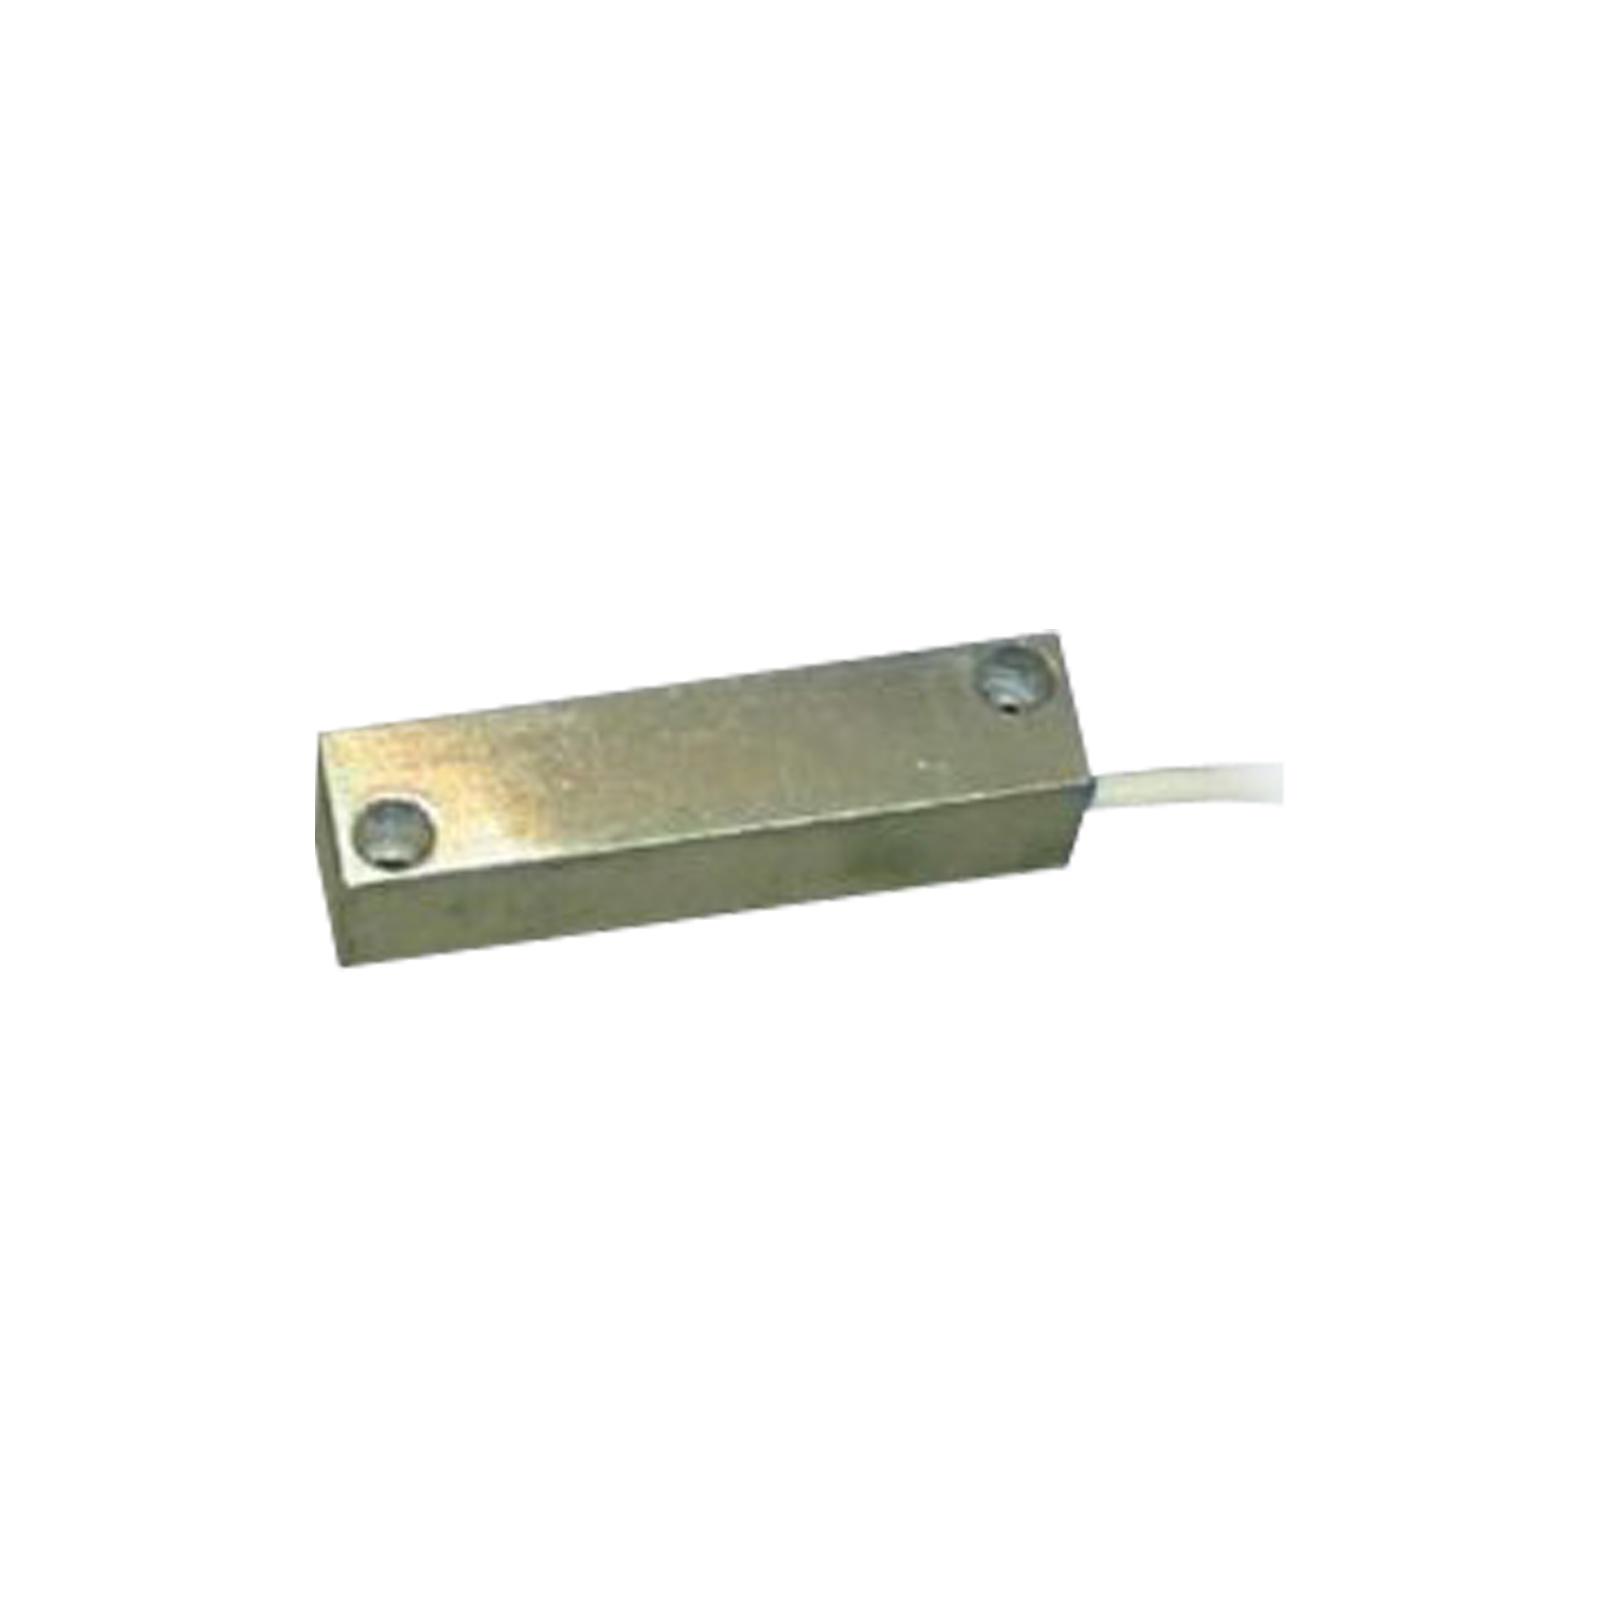 sensor-piezoelectric-vibration-seismic